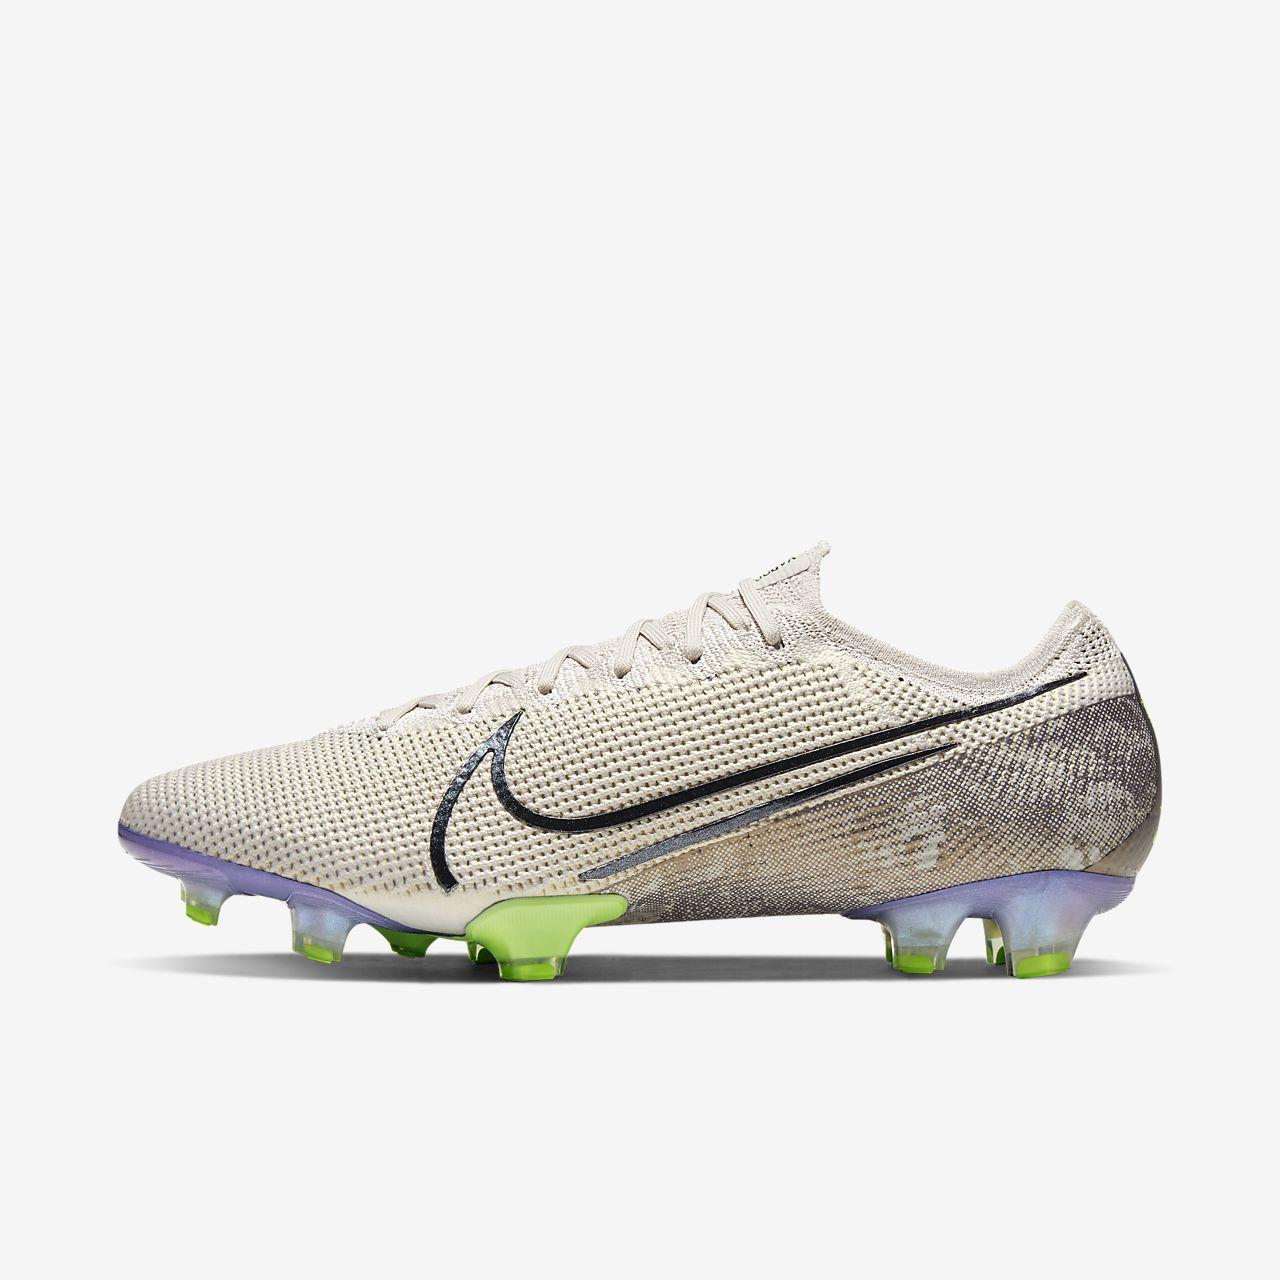 Nike Mercurial Vapor Pro football boots Football store